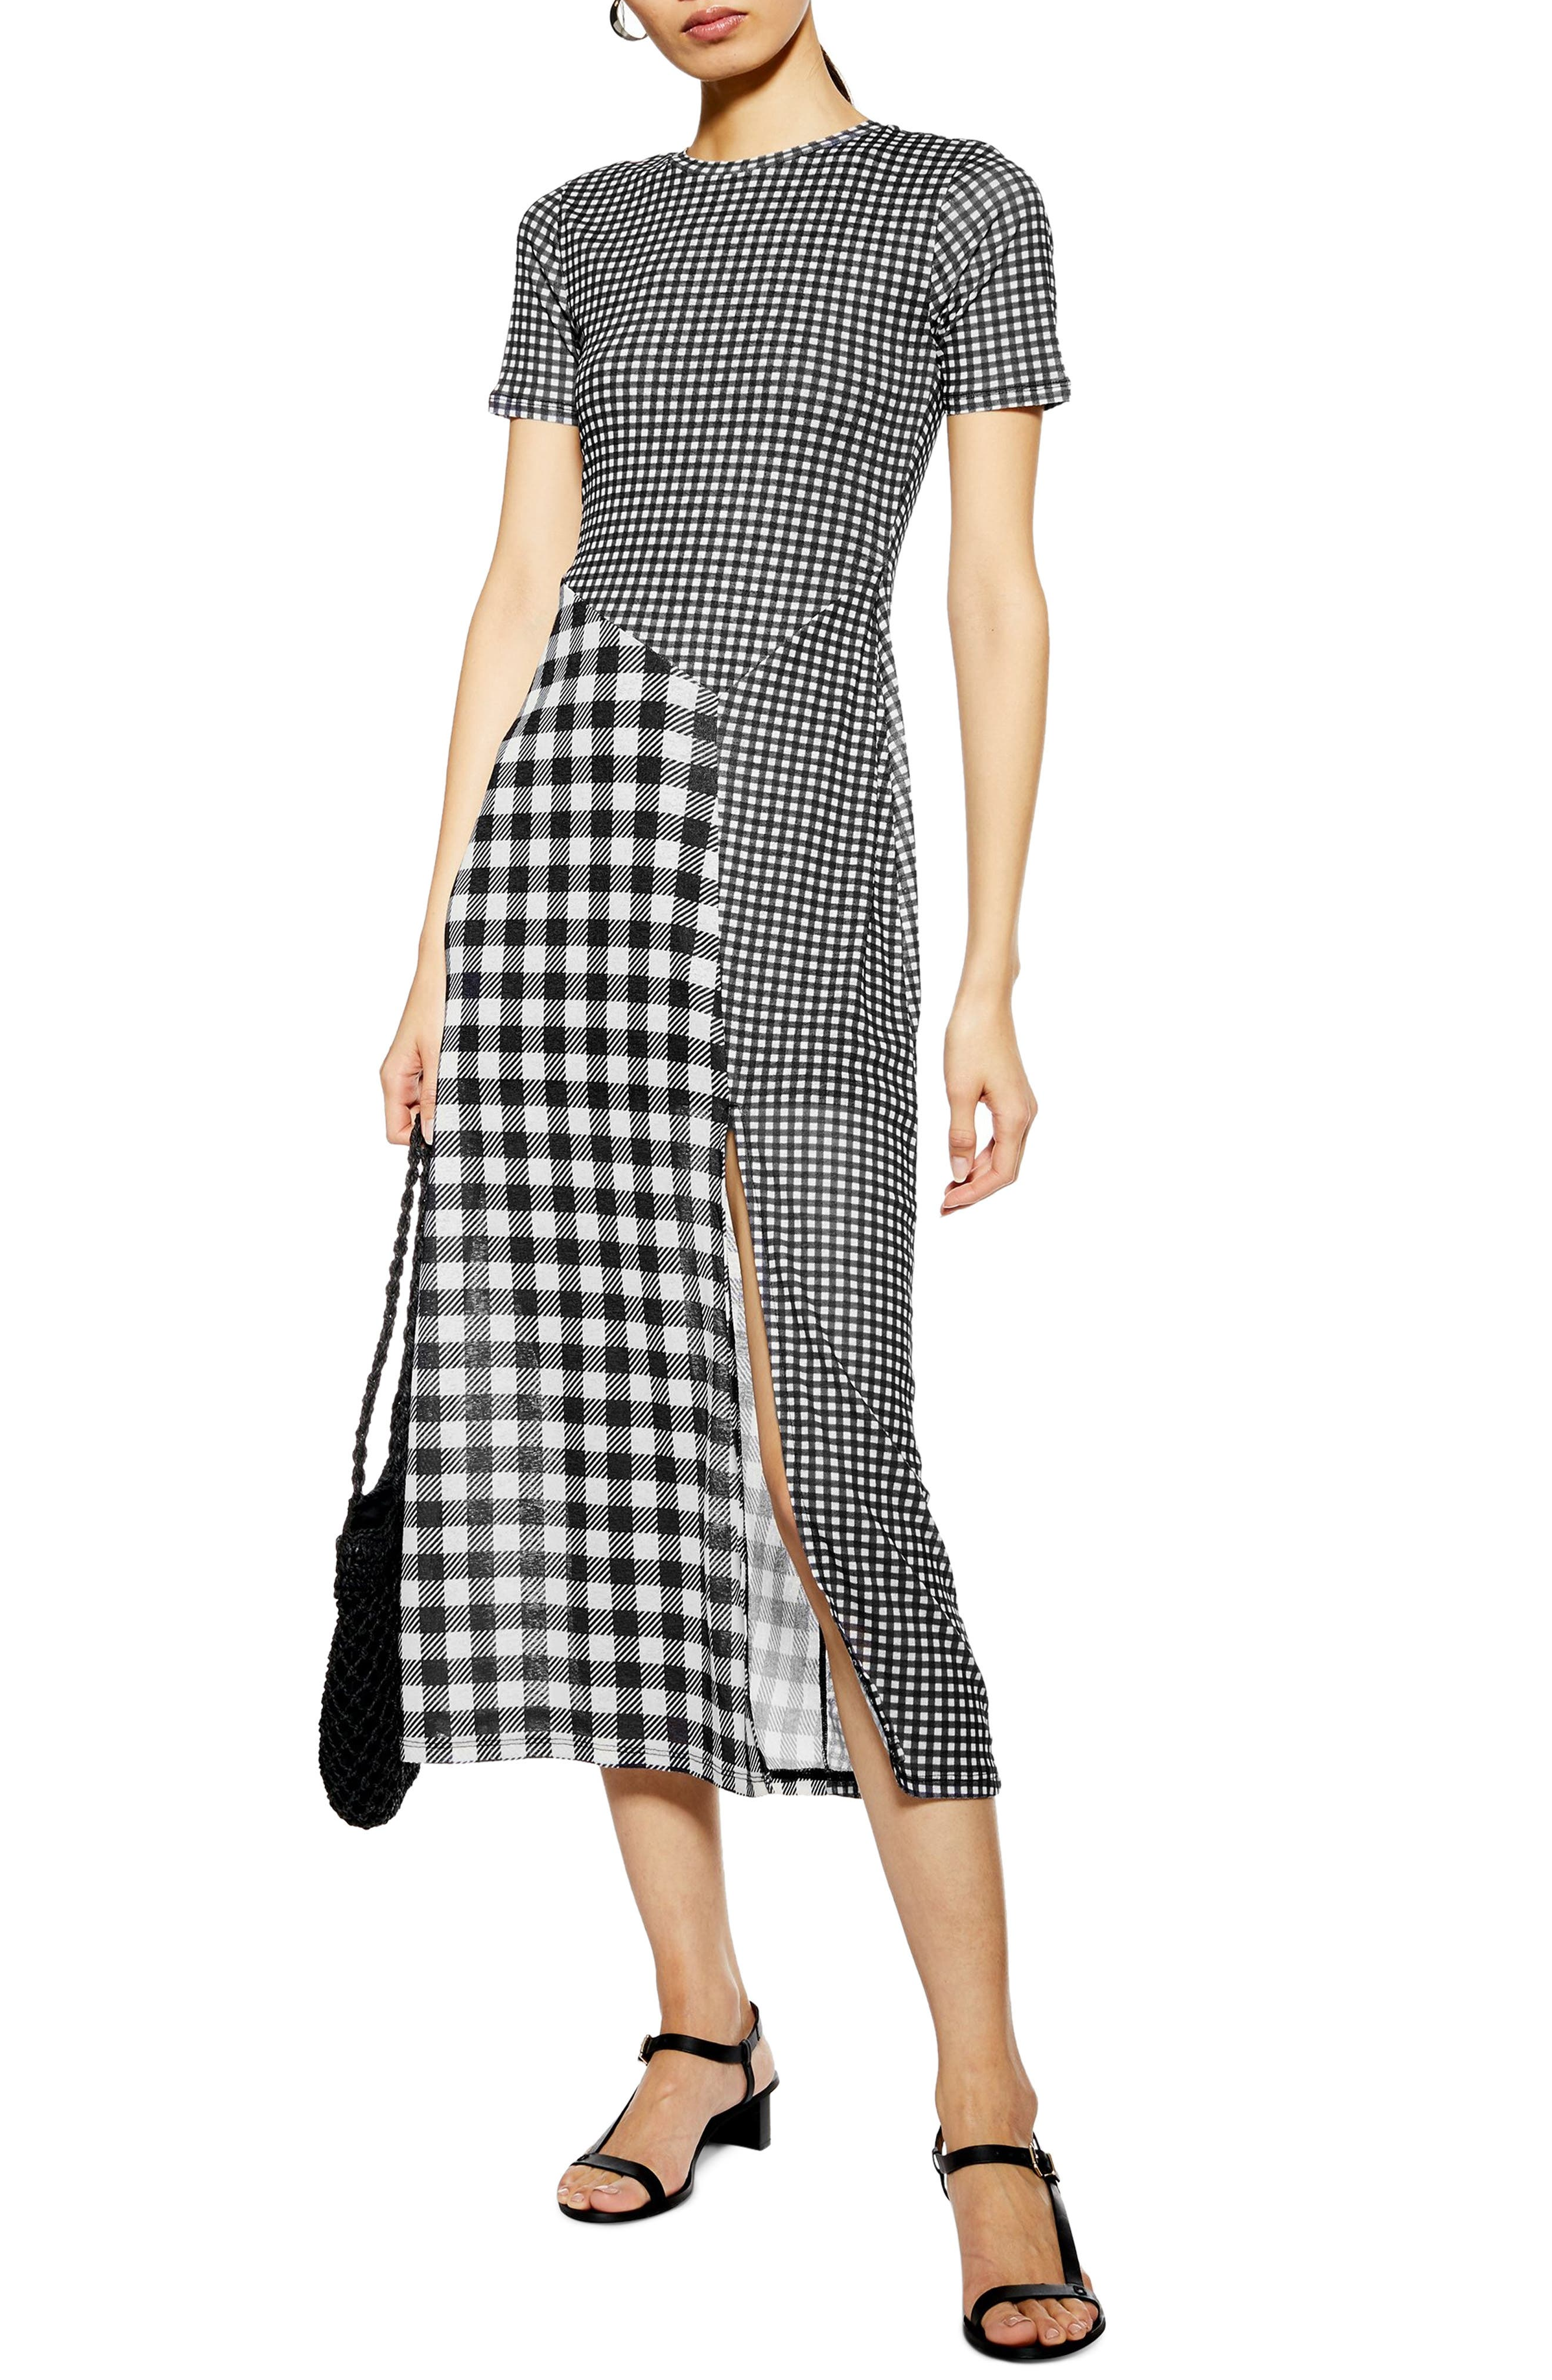 Topshop Gingham Midi Dress, US (fits like 0) - Black